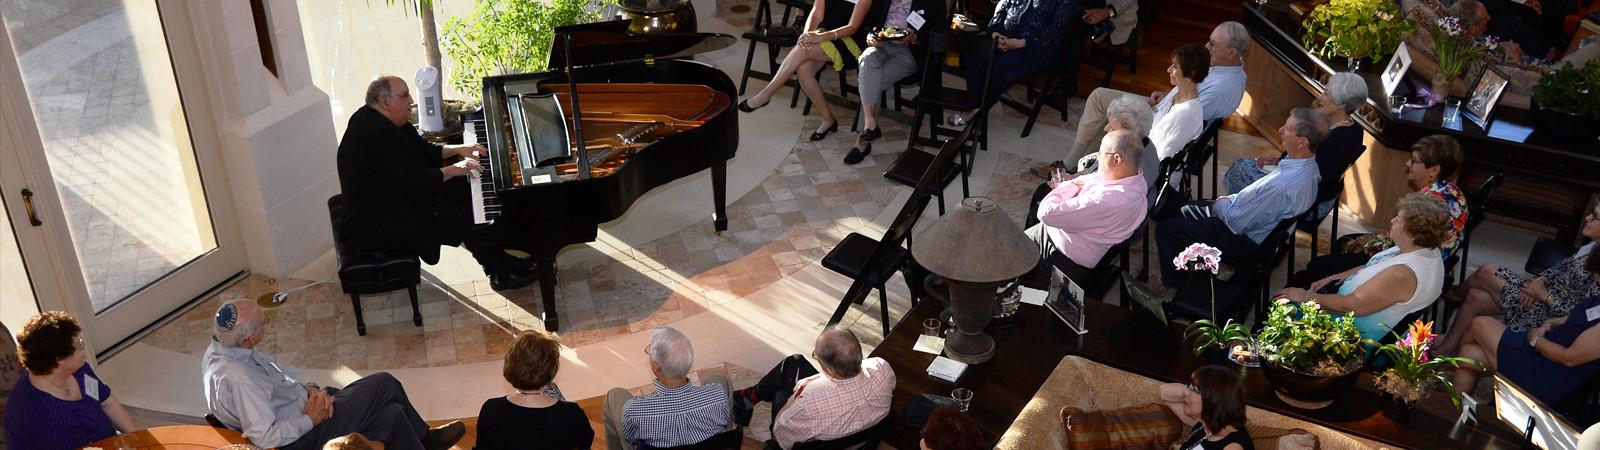 david-syme-piano-5